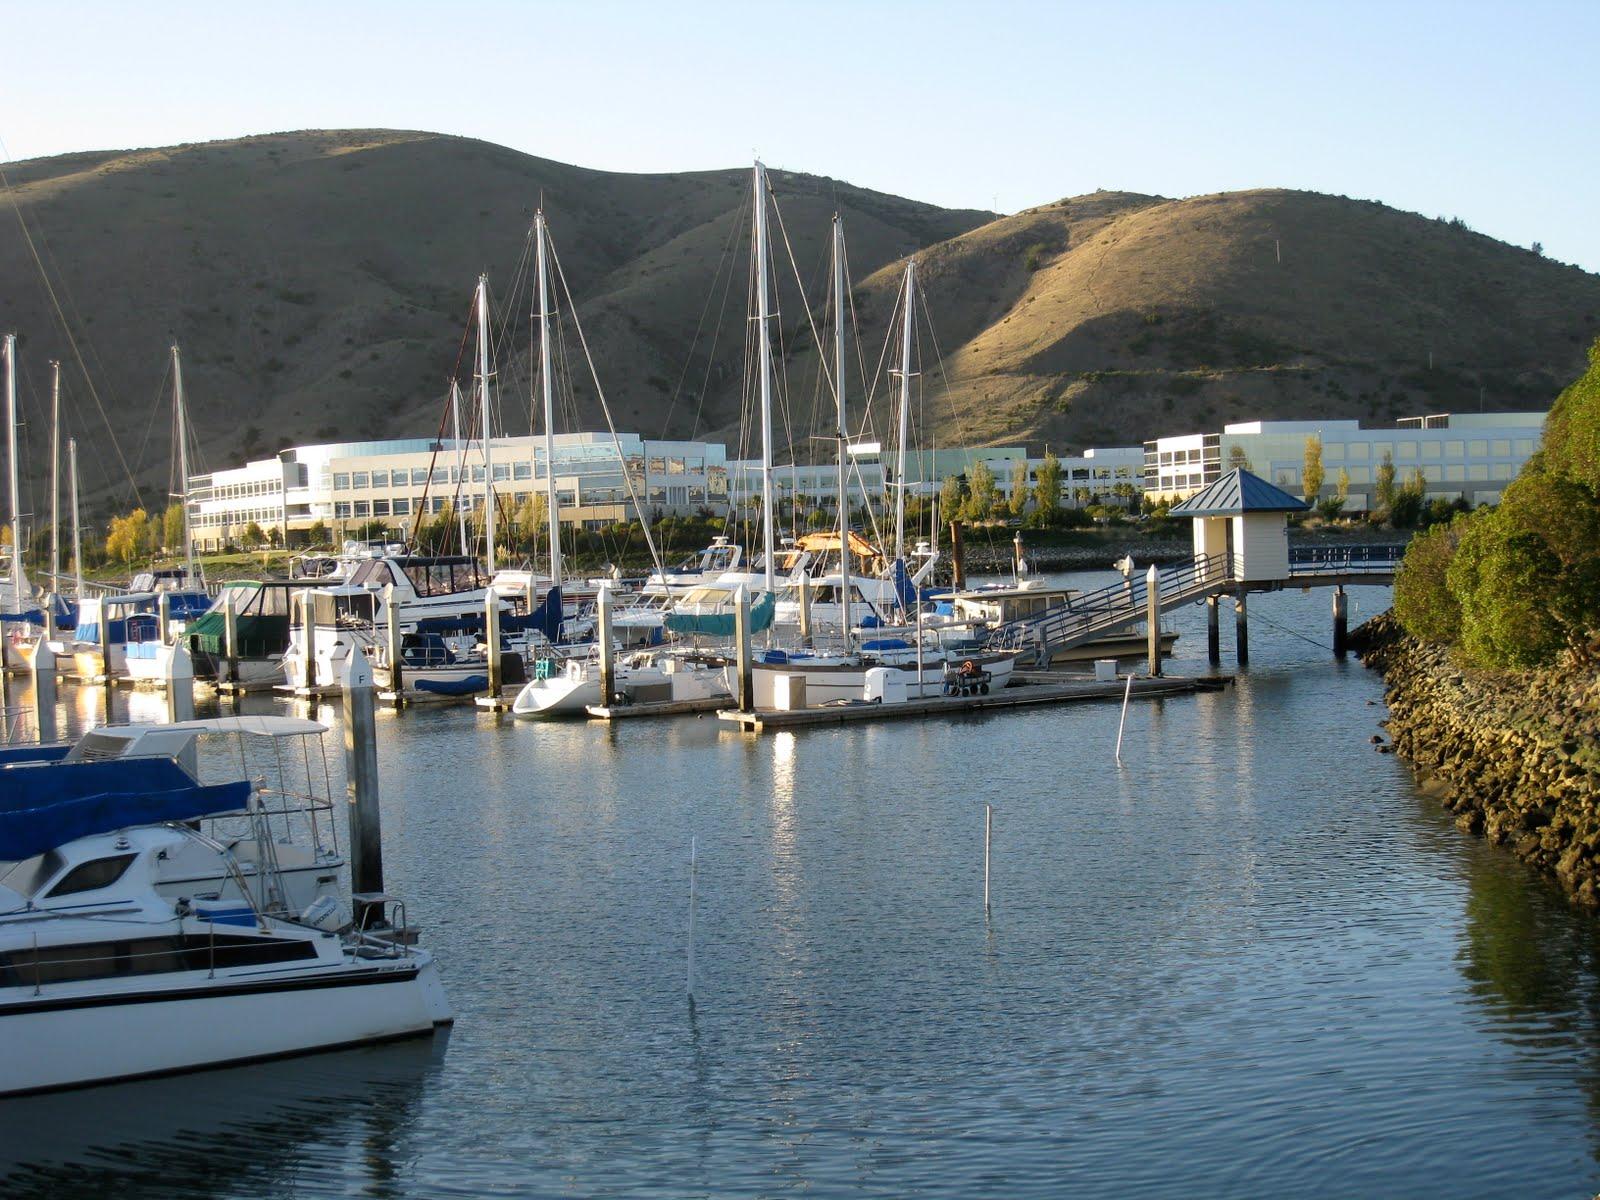 Walking San Francisco Bay: Oyster Pt  to Oyster Cove Marina - Nov